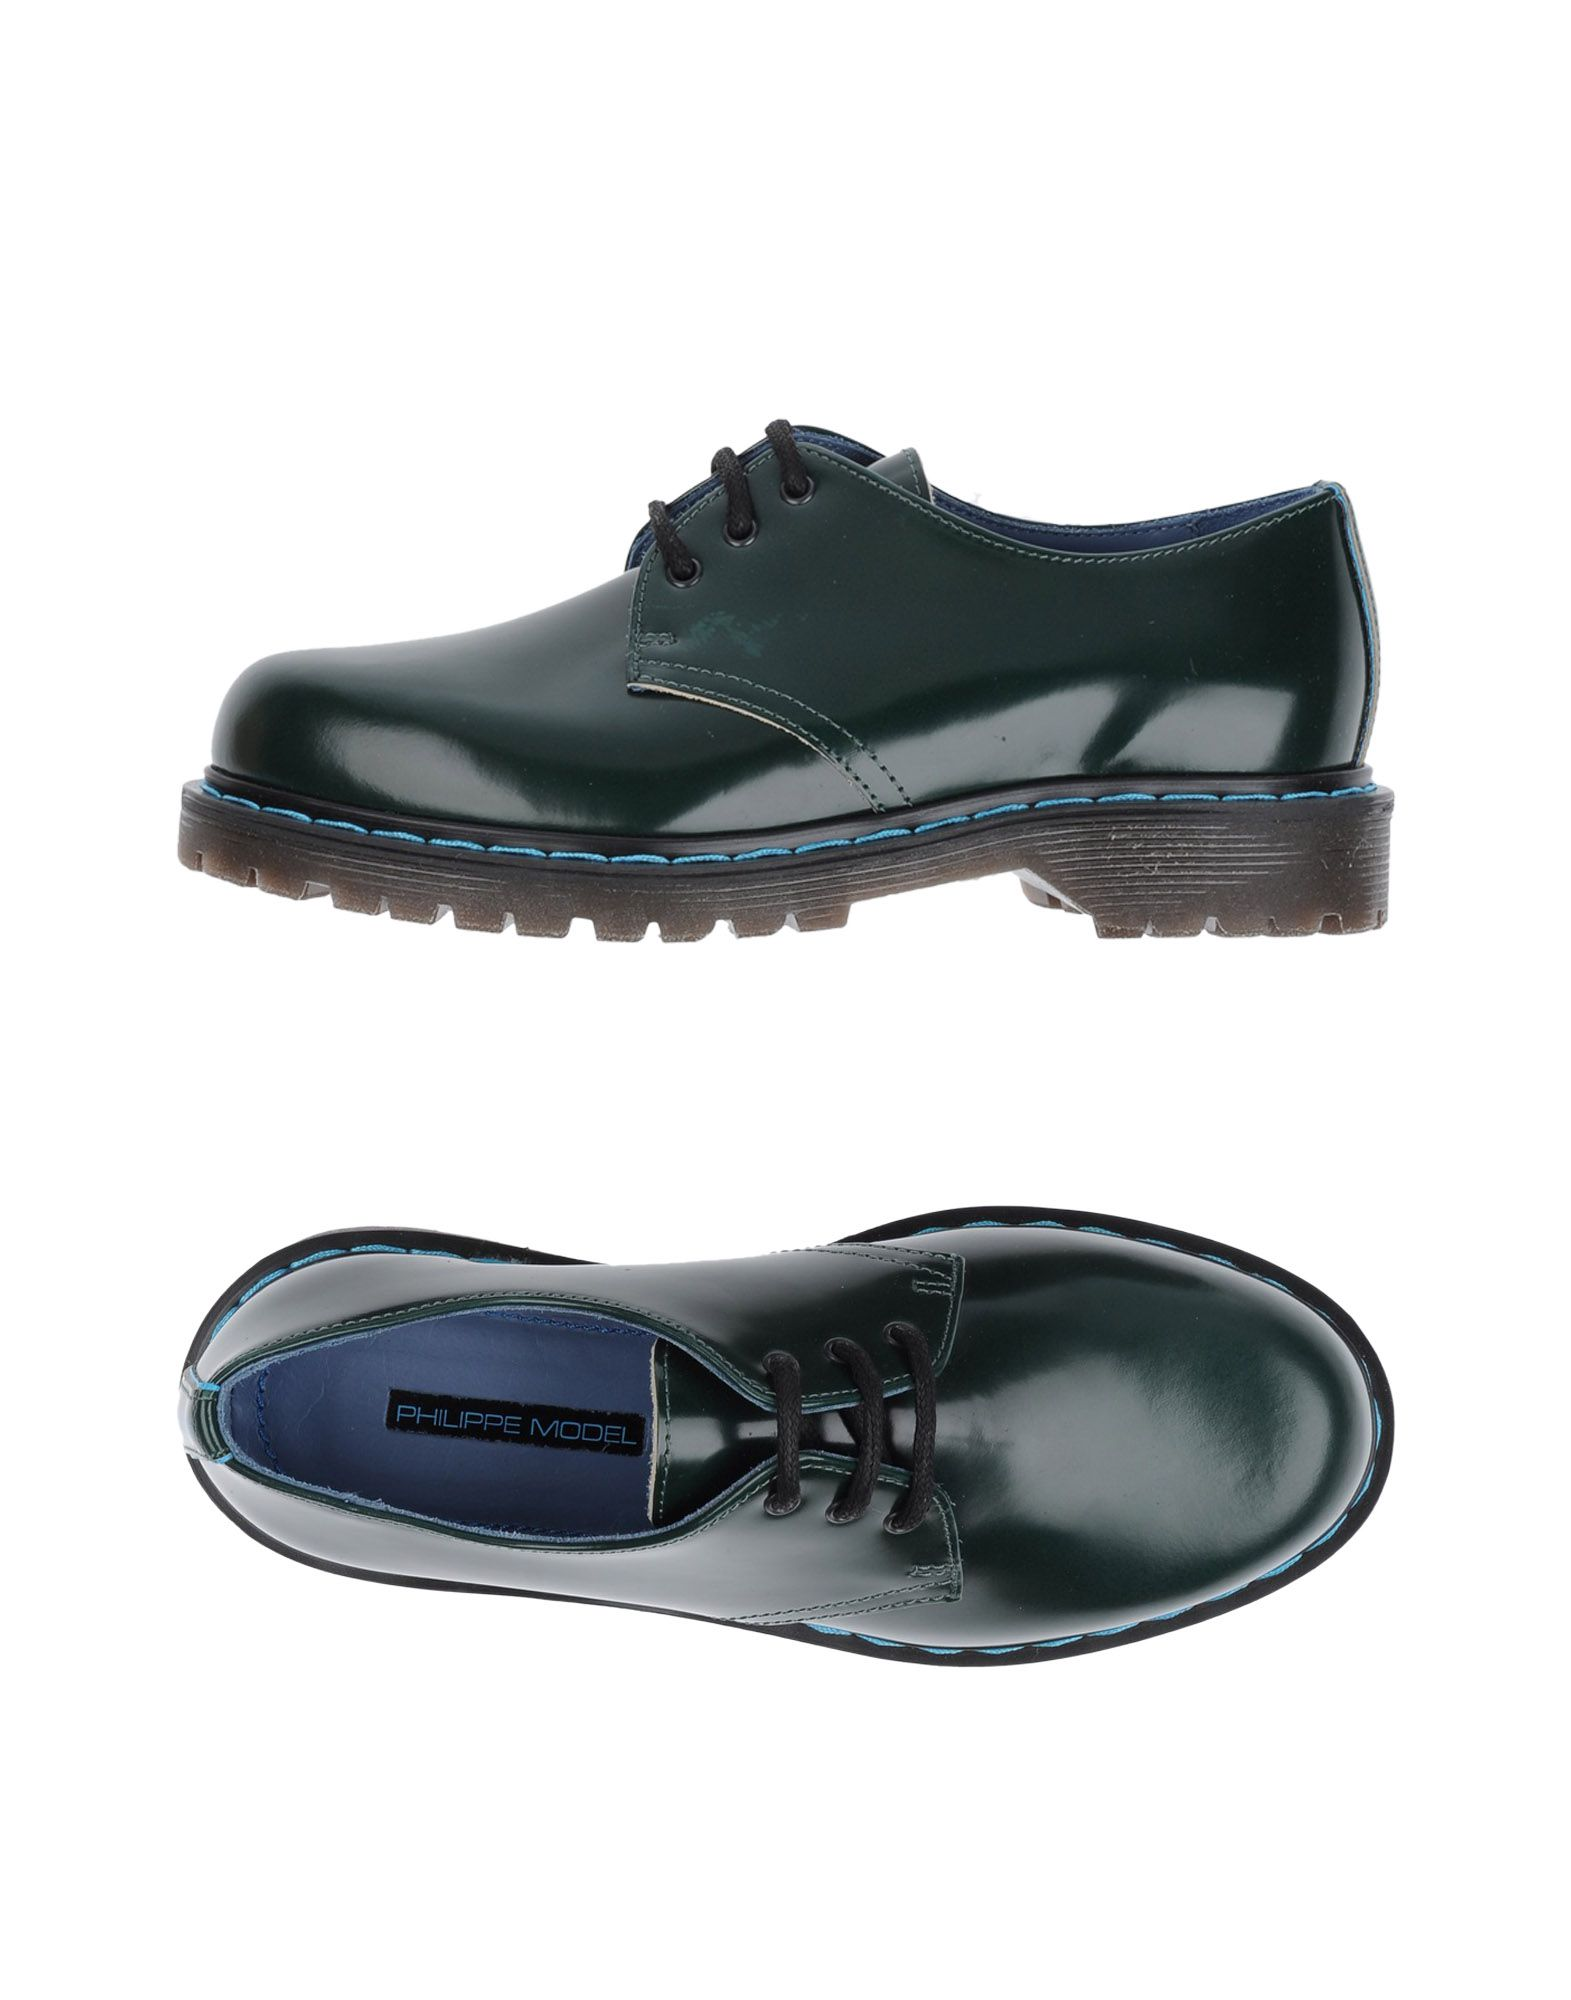 Philippe Model Schnürschuhe Damen  11259044II Gute Qualität beliebte beliebte Qualität Schuhe 78e1f3